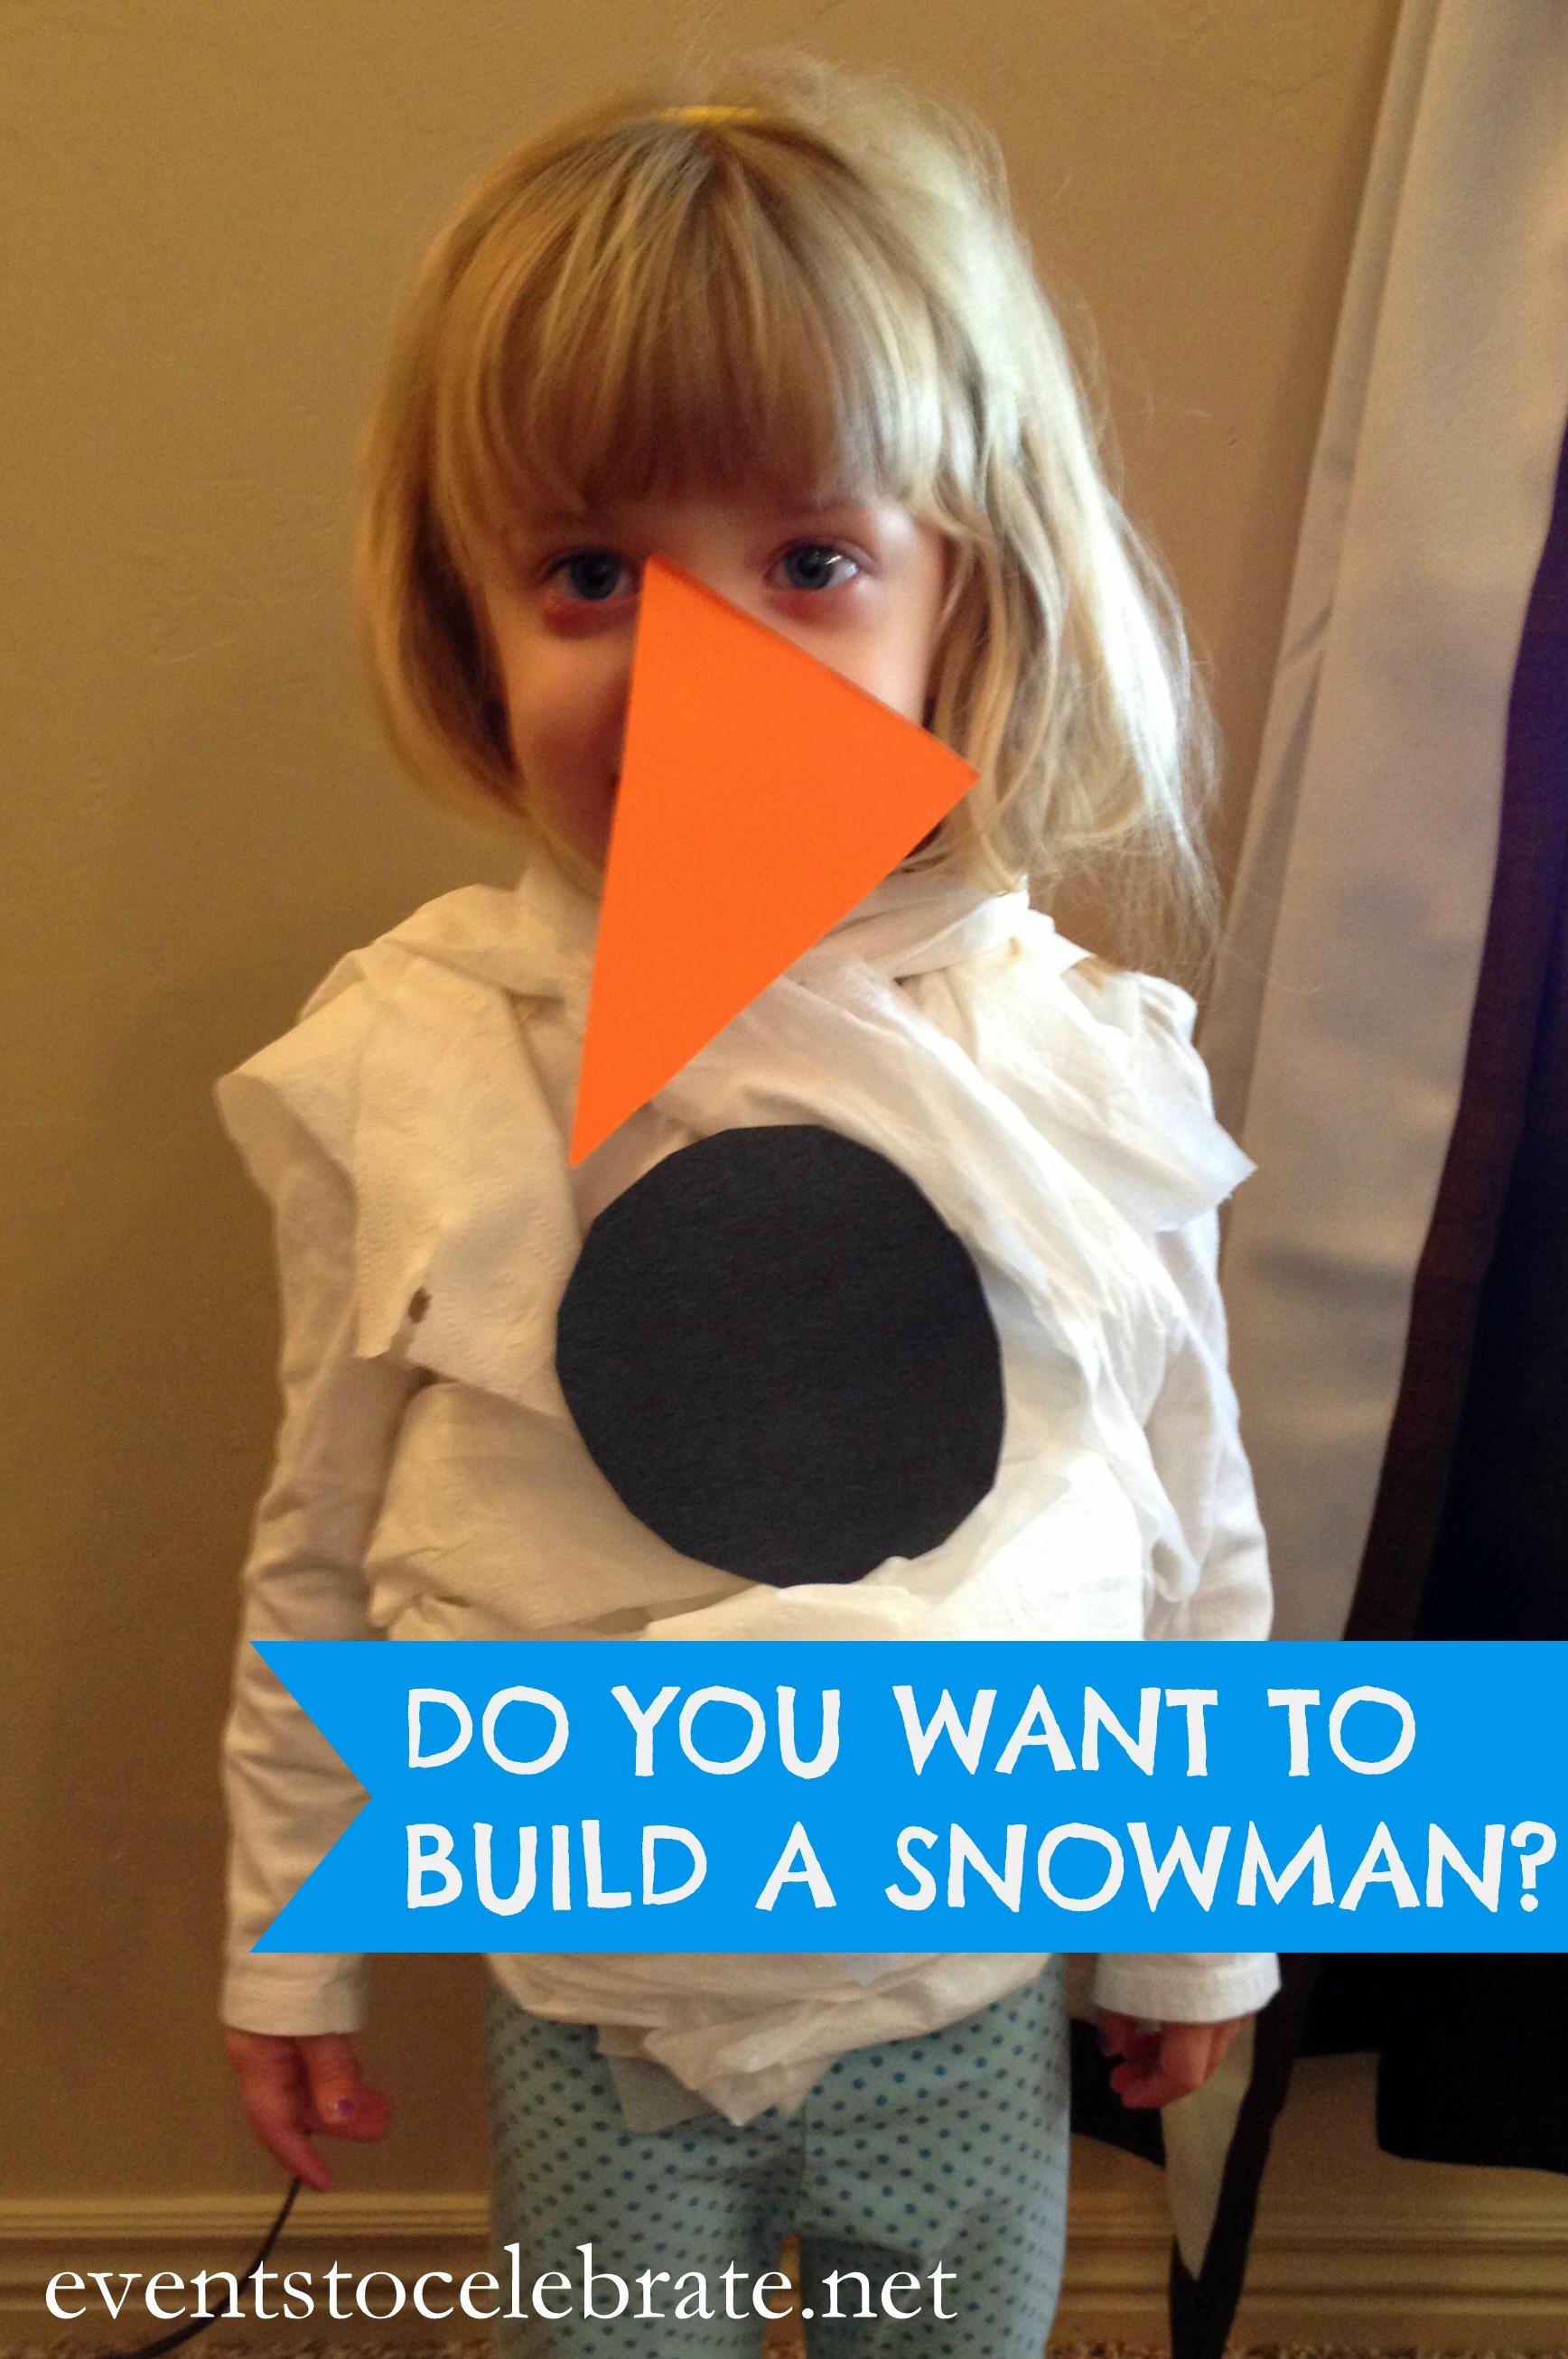 FROZEN SNOWMAN GAME - eventstocelebrate.net